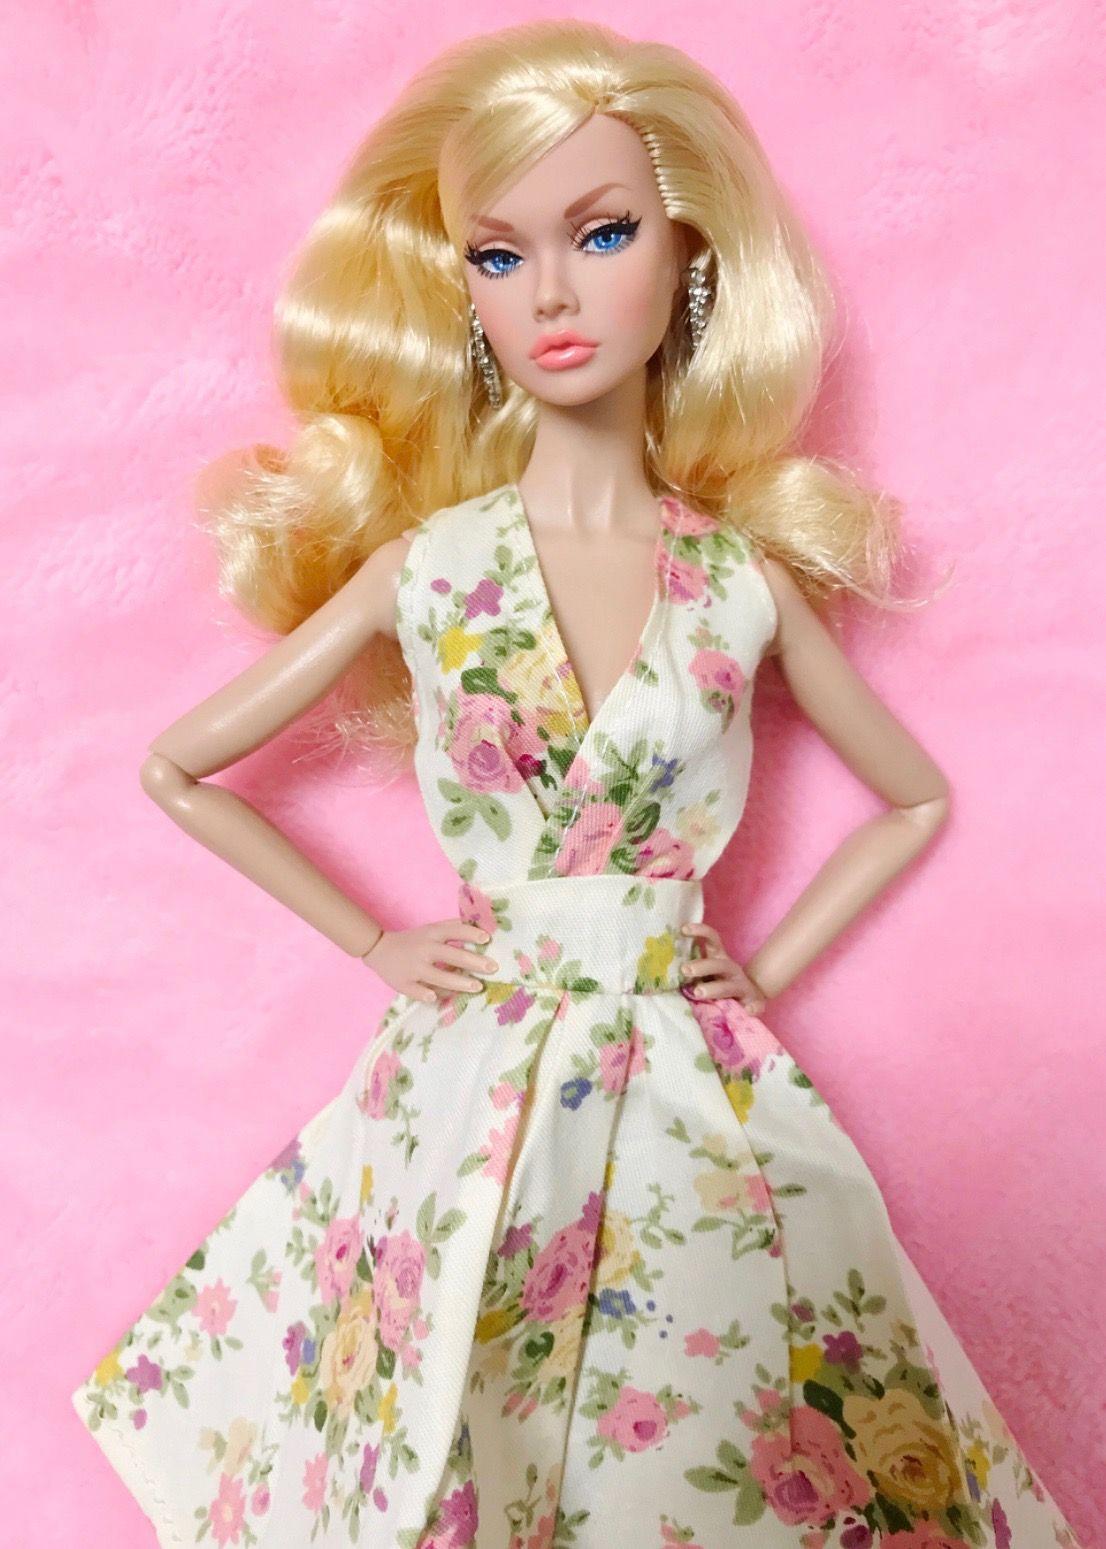 7702209479607 35.25.3/kstp89 | Barbies Dresses Dolls (C) | Fashion dolls, Pink ...